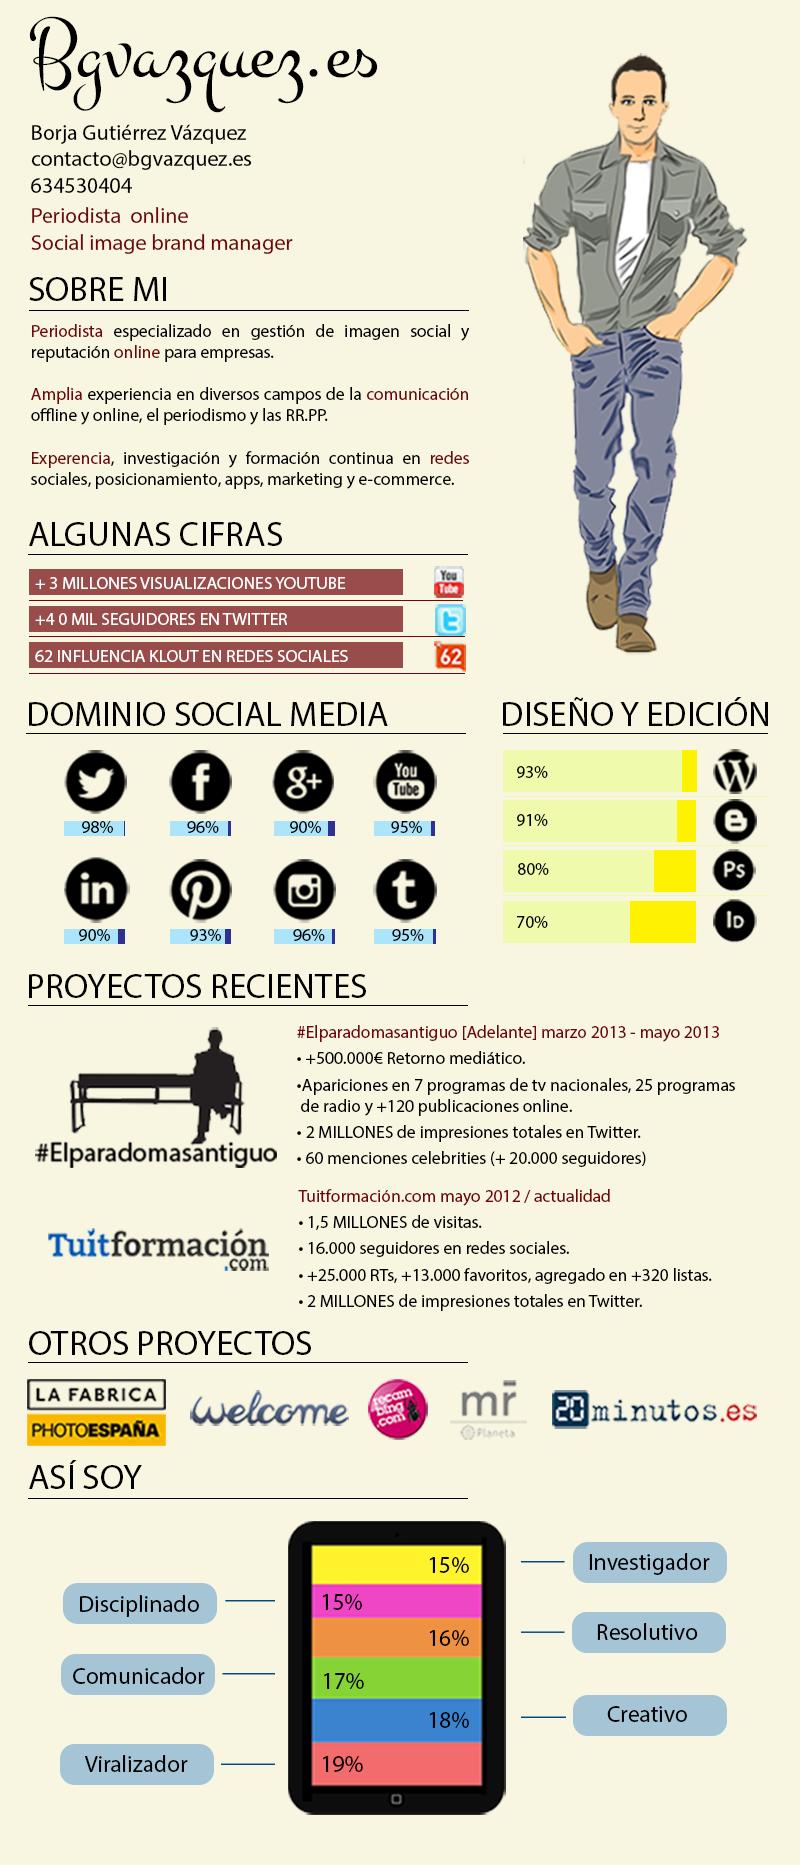 Mi currículum vitae en infografía. CV Infográfico. Bgvazquez. Borja ...